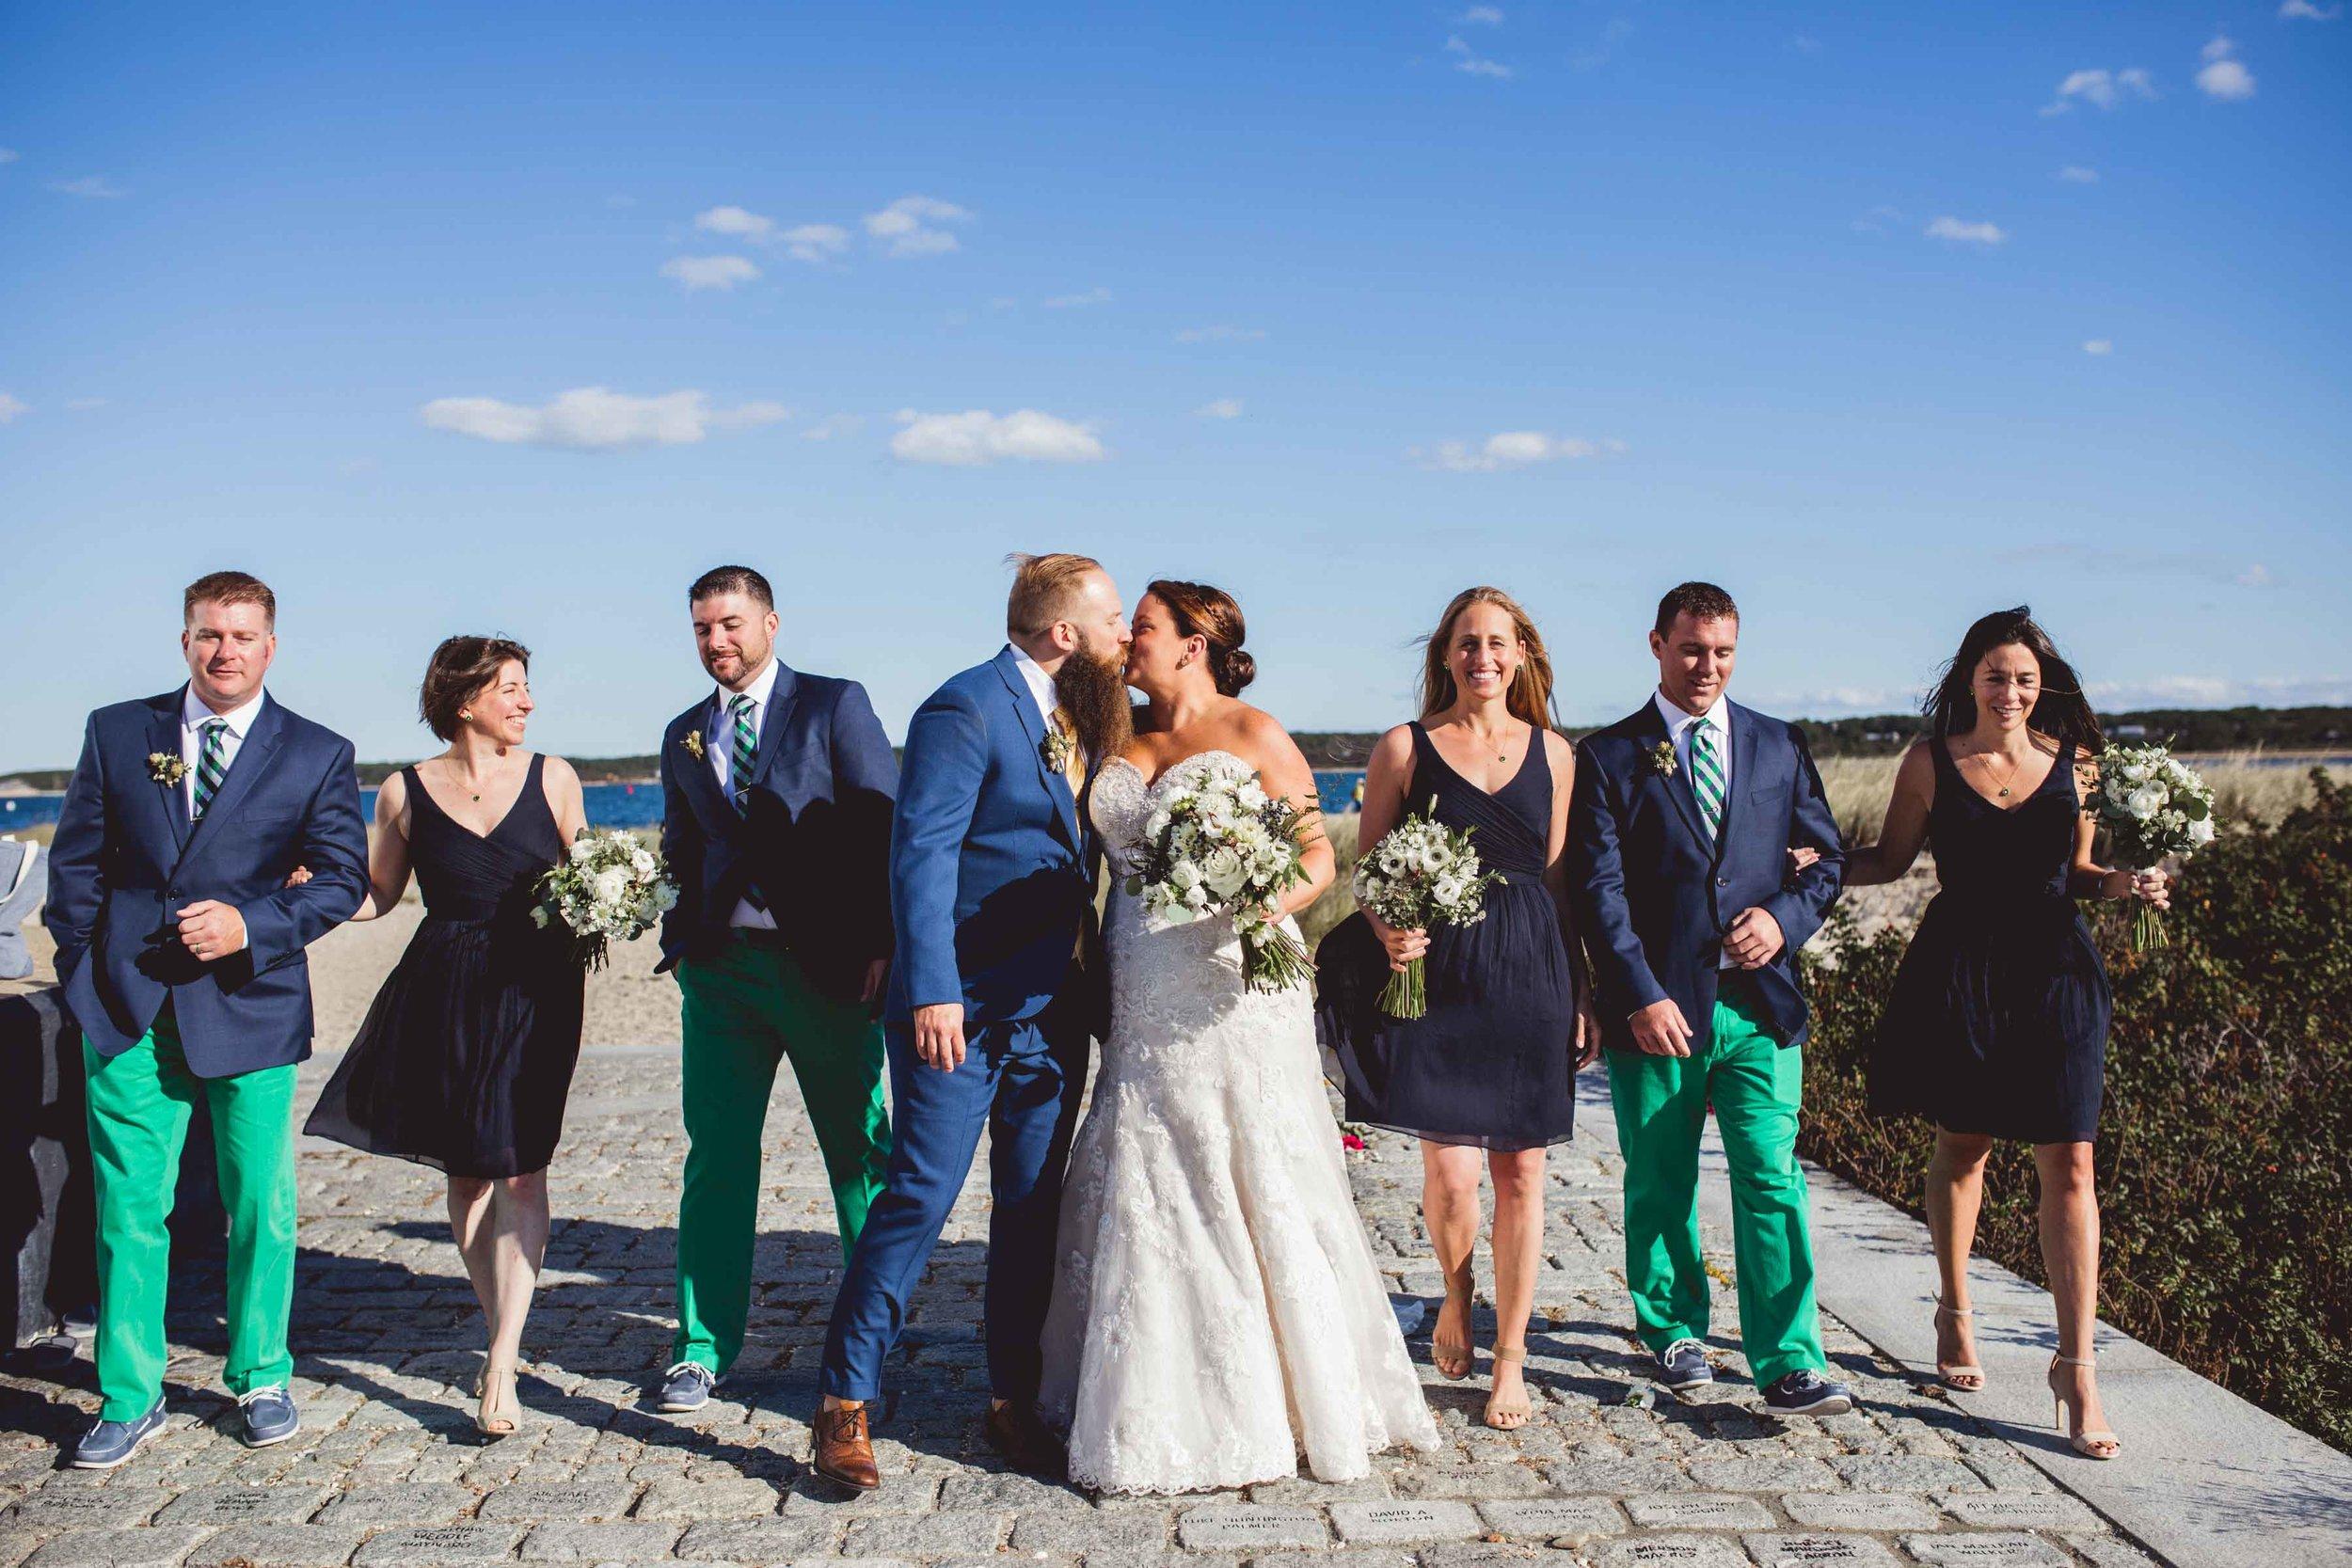 Marthas-vineyard-wedding-43.jpg